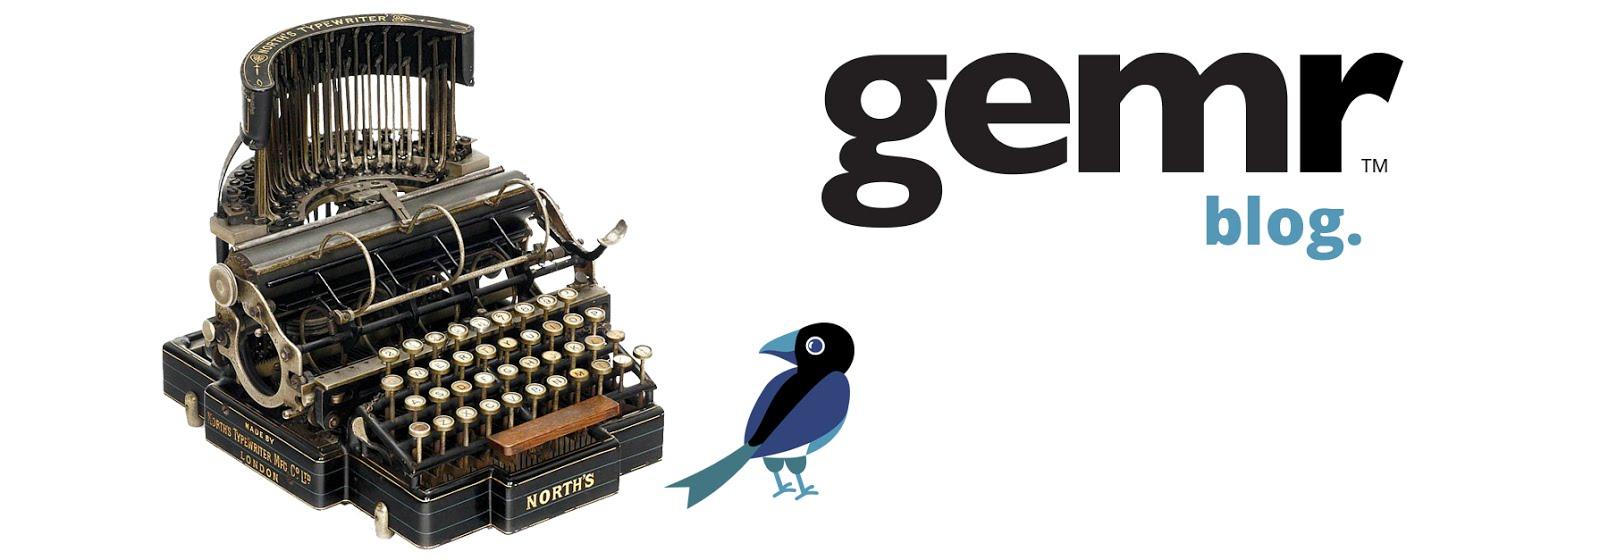 GEMR Blog